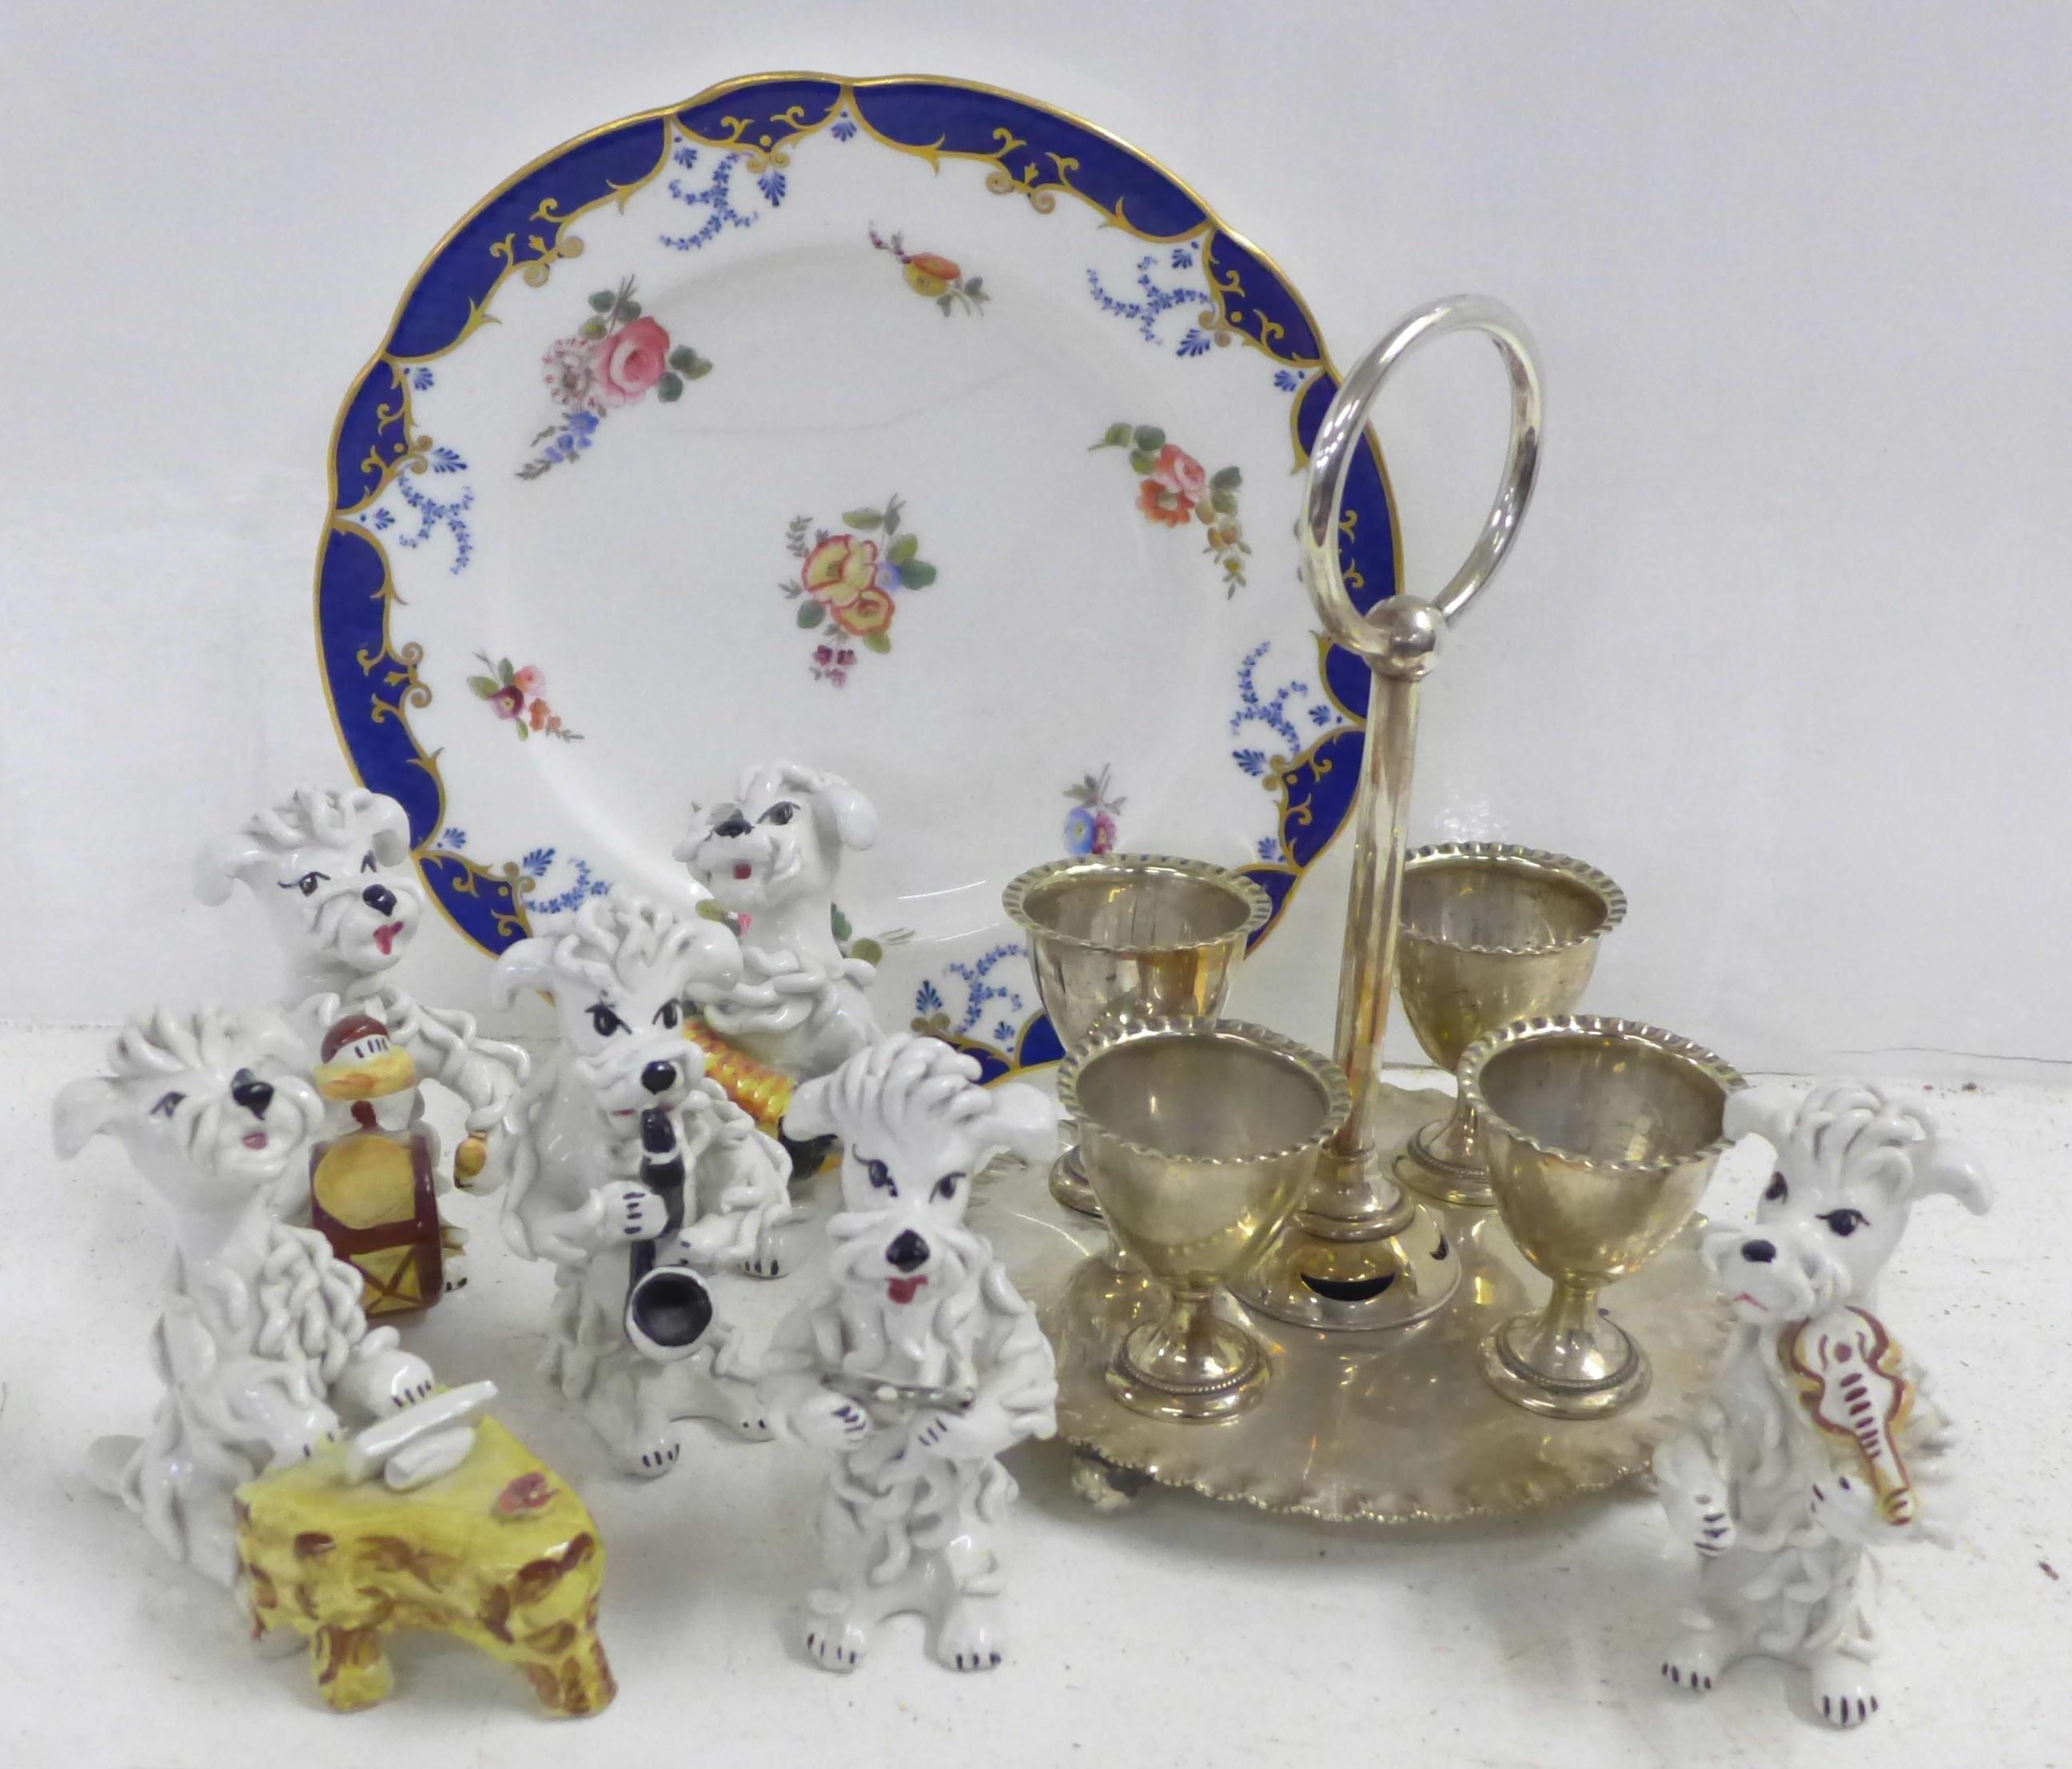 Six novelty Italian pottery poodle 'bandsmen', a plated egg cruet and a Copeland plate, a/f **PLEASE